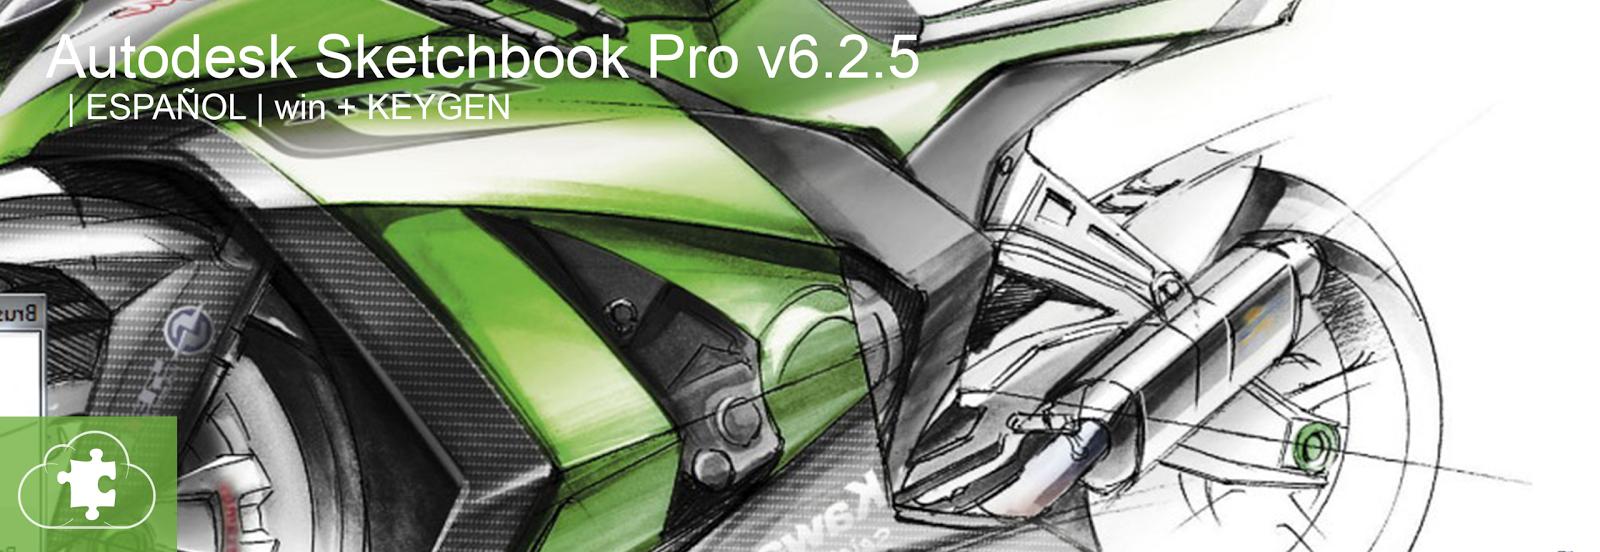 Autodesk Sketchbook Pro v6.2.5 | Win | ESPAÑOL